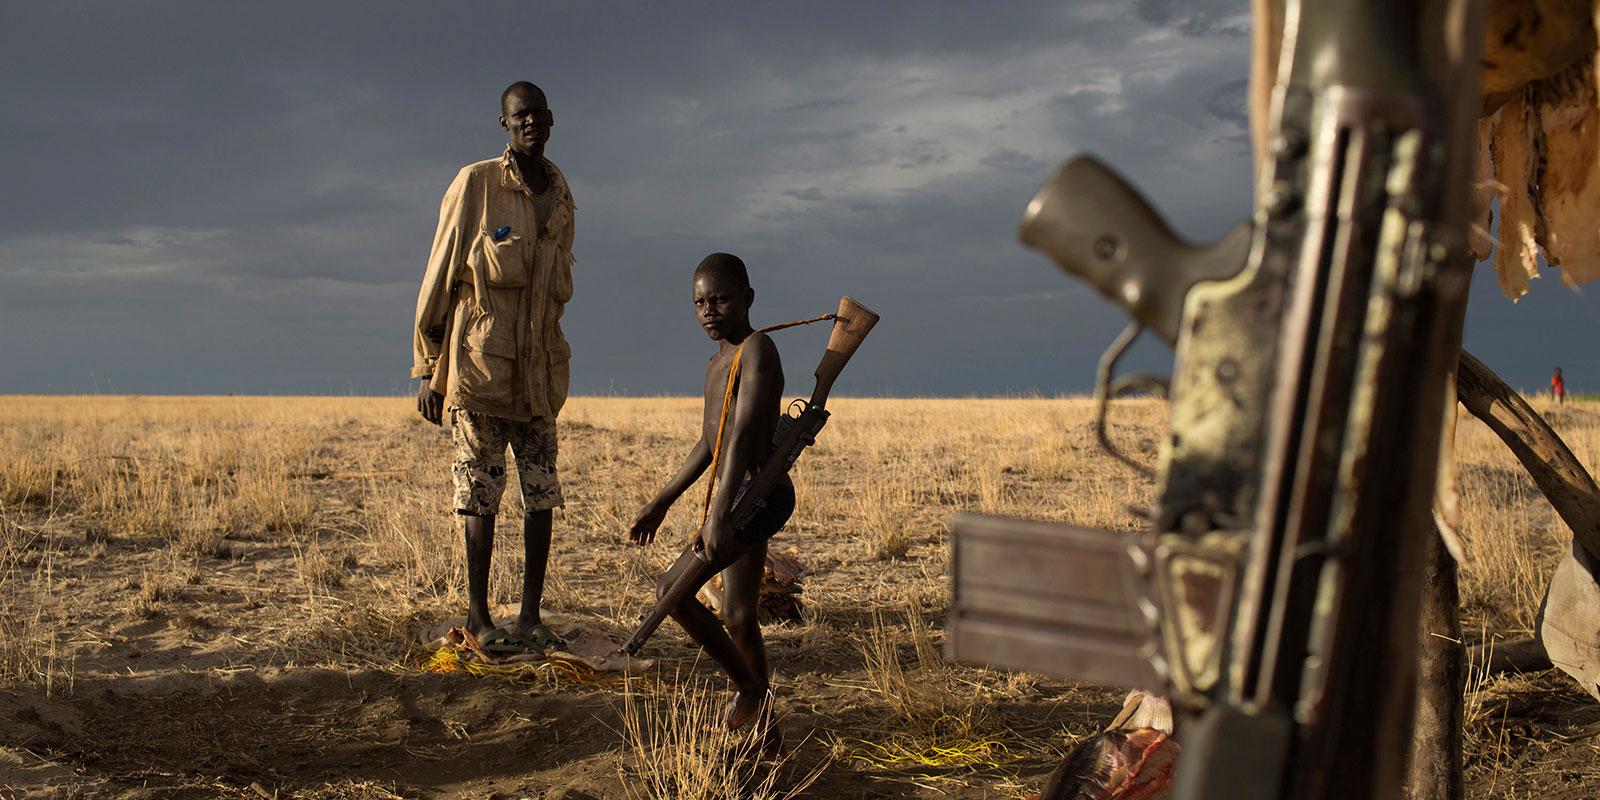 REUTERS/Siegfried Modola